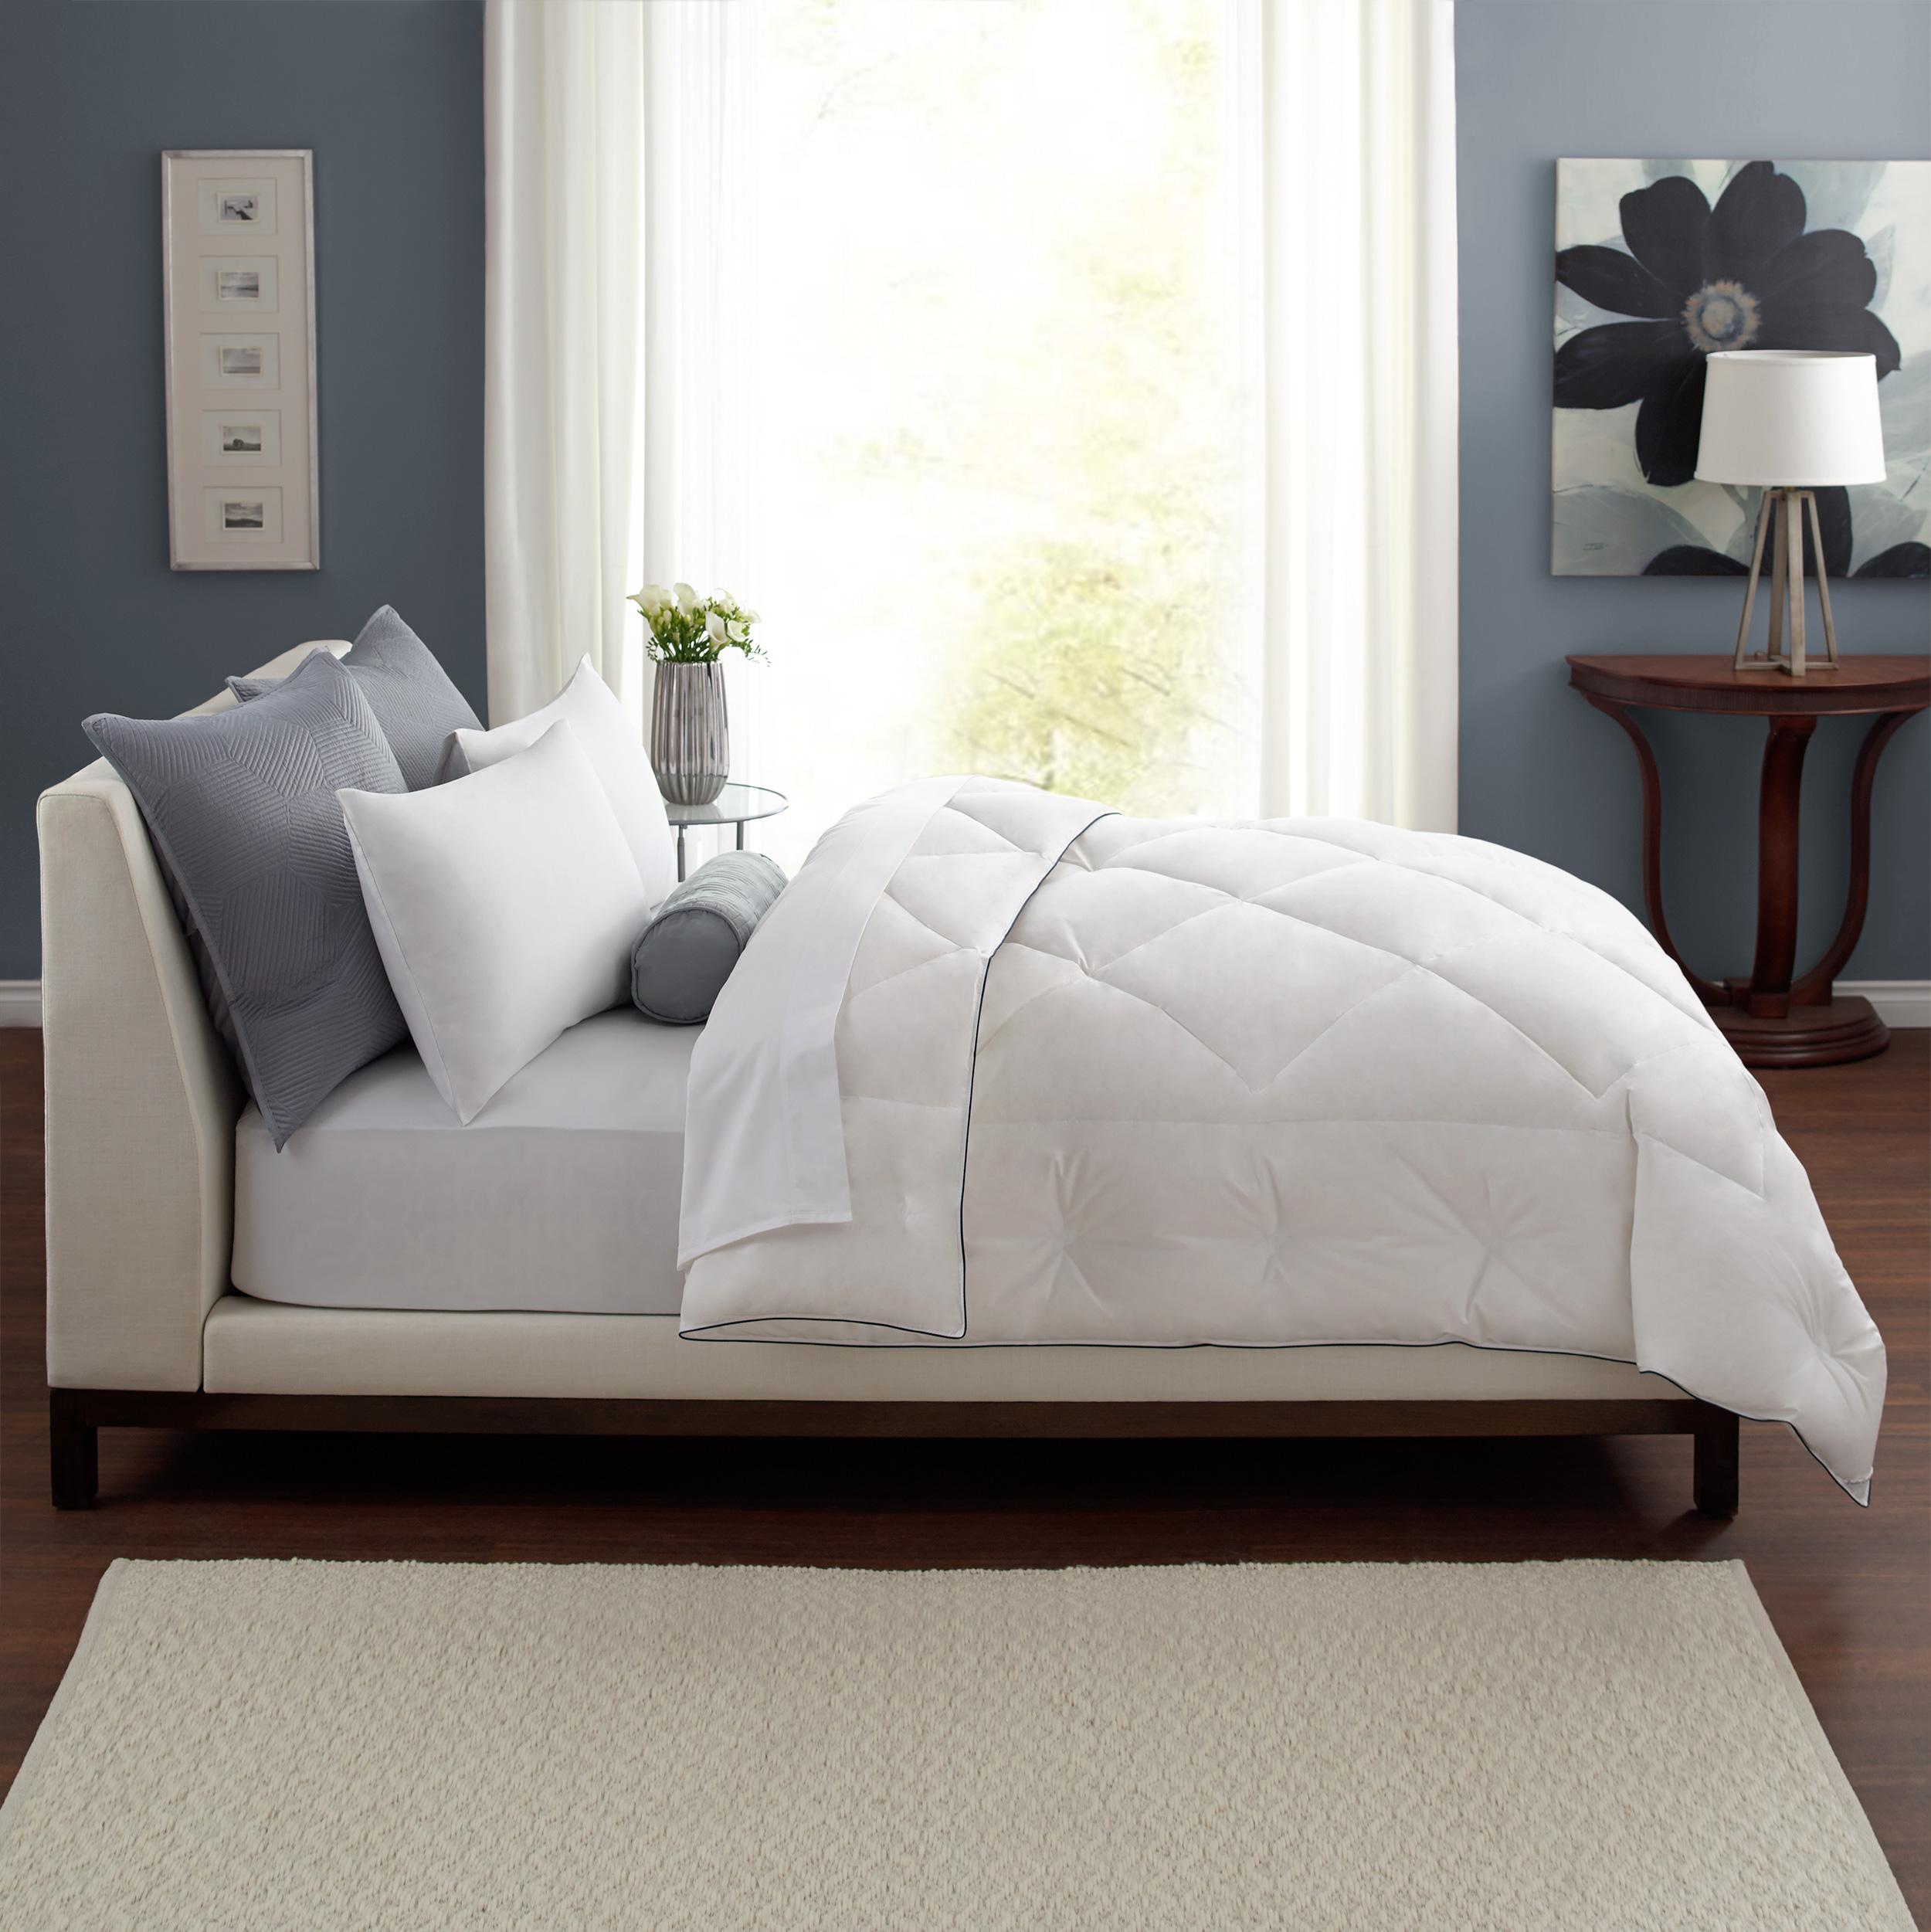 Shop Classic Comforter